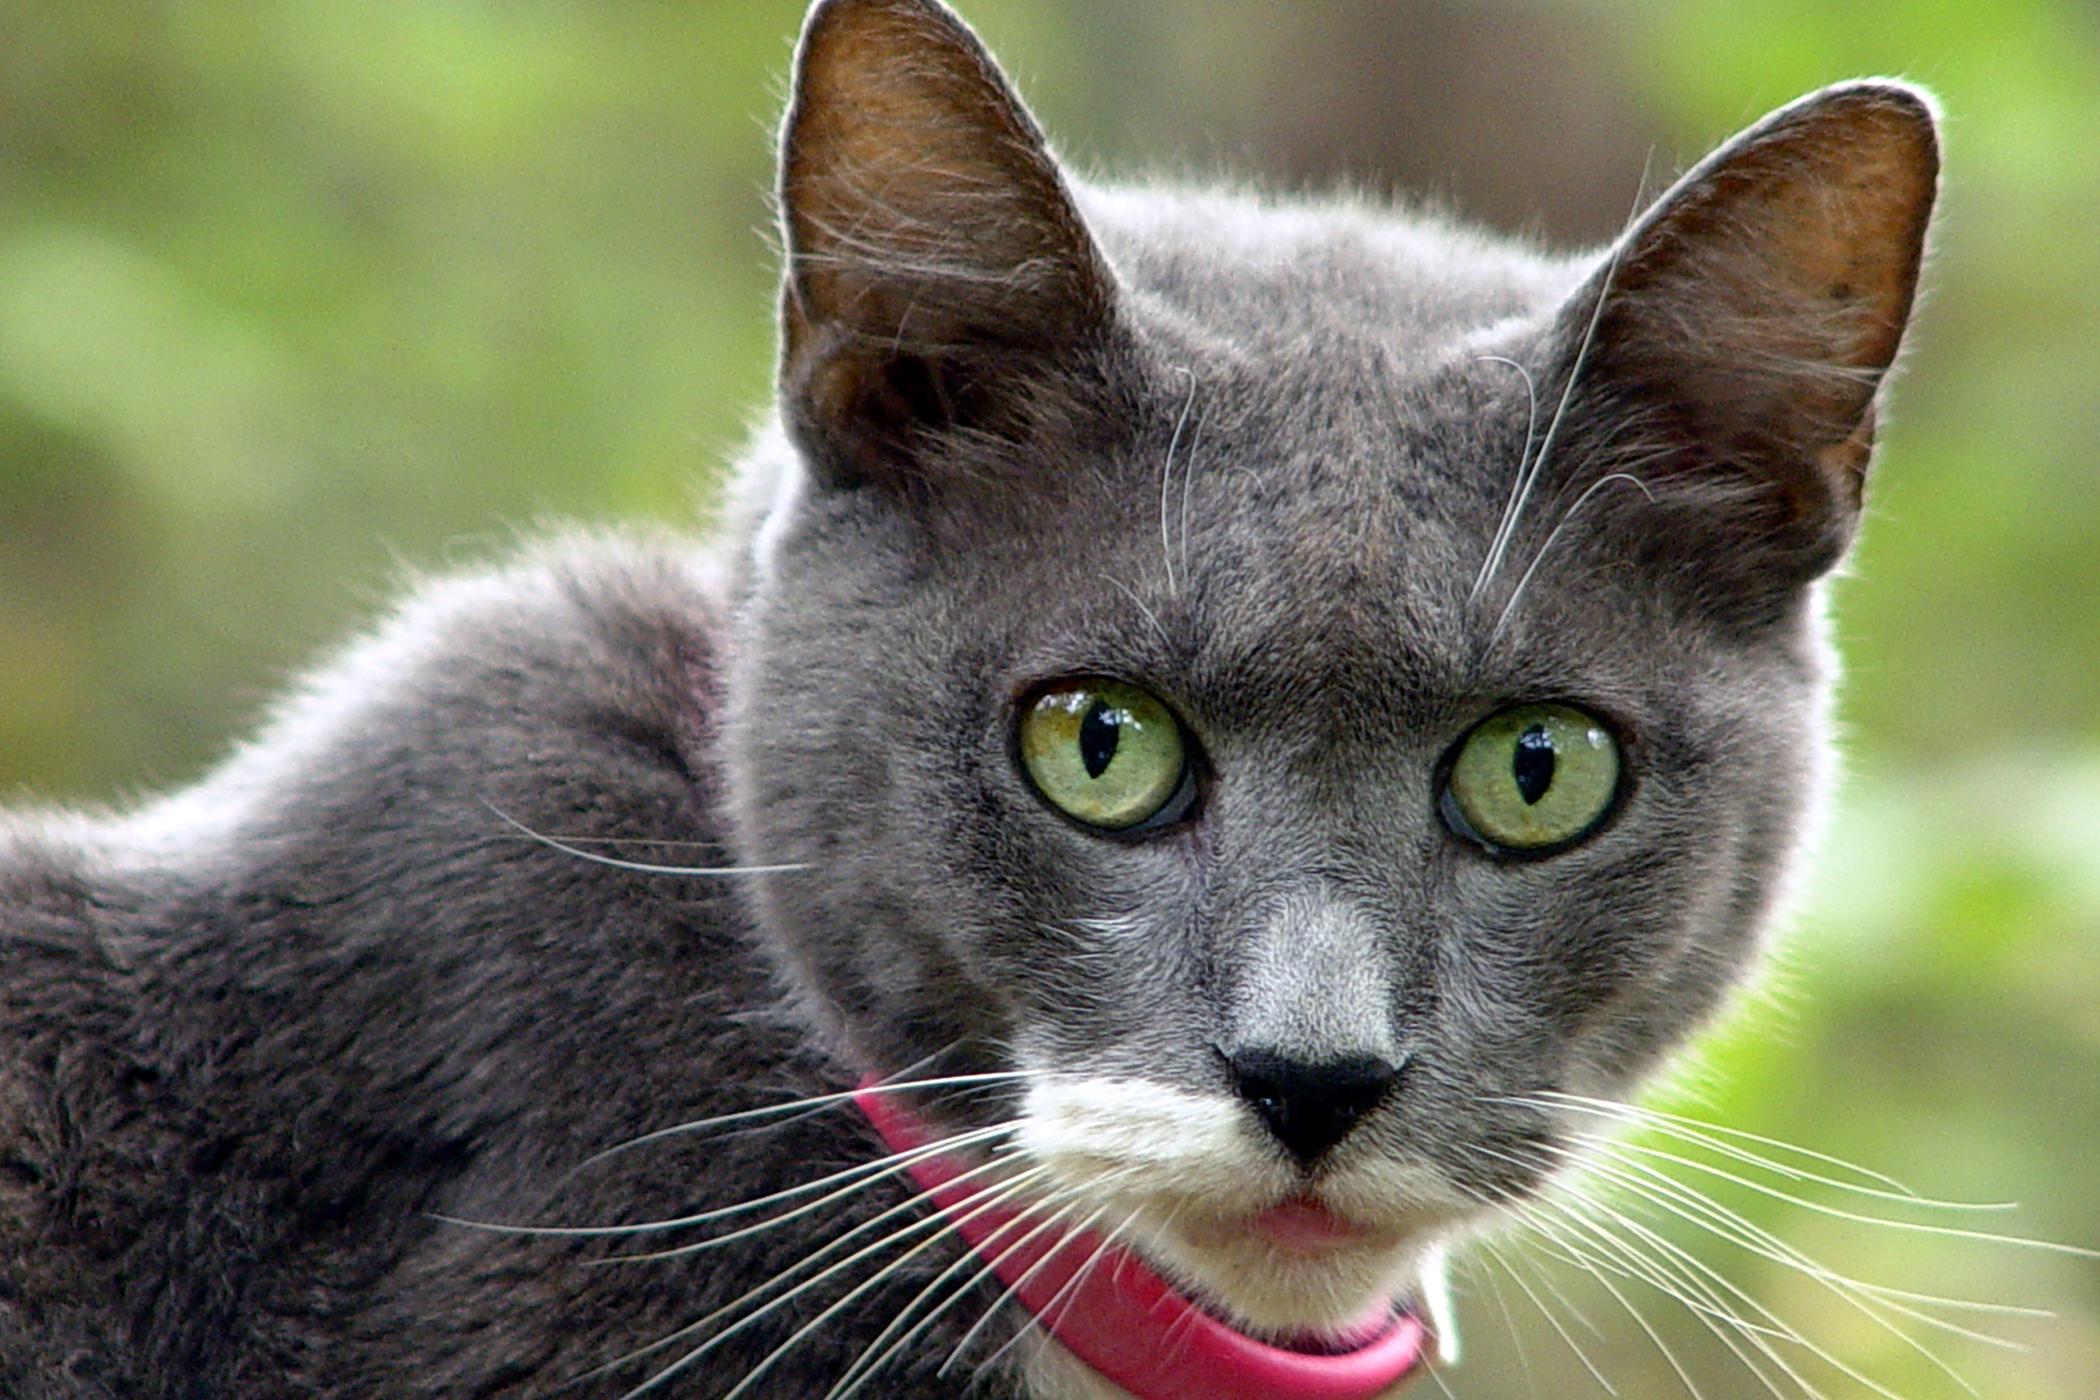 Collar Allergy in Cats